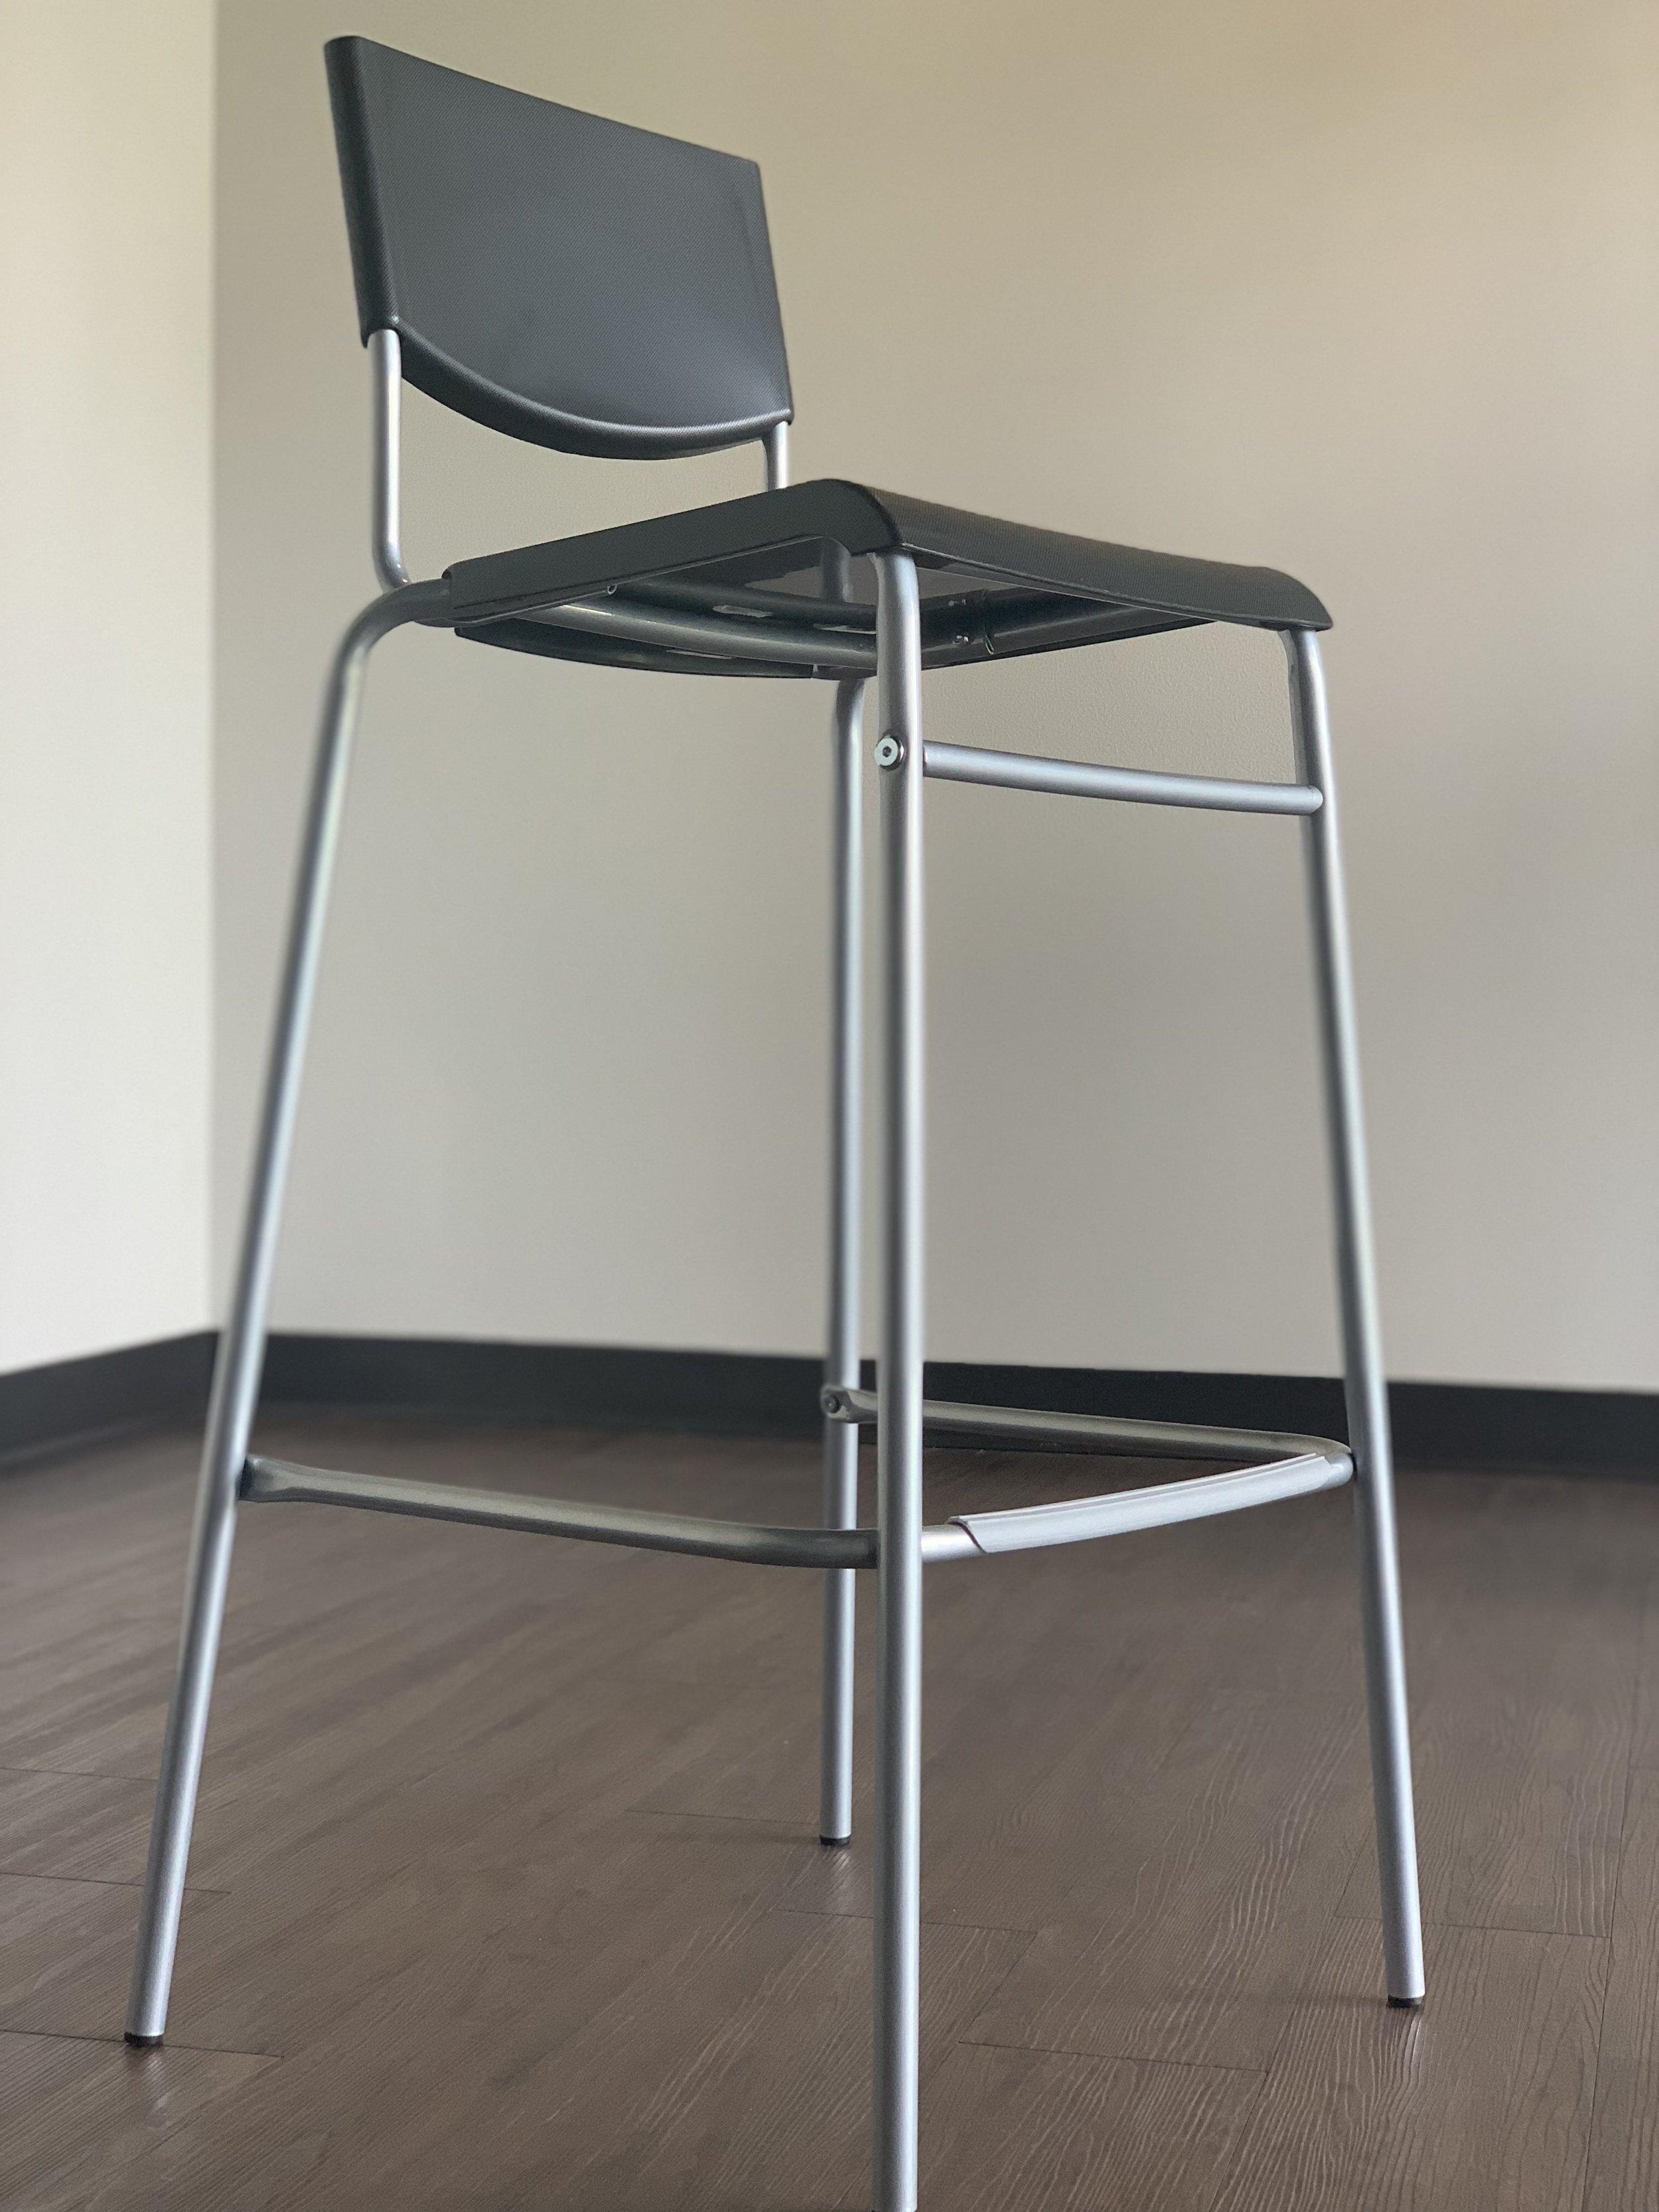 Bar stool chair rentals in dallas.jpg